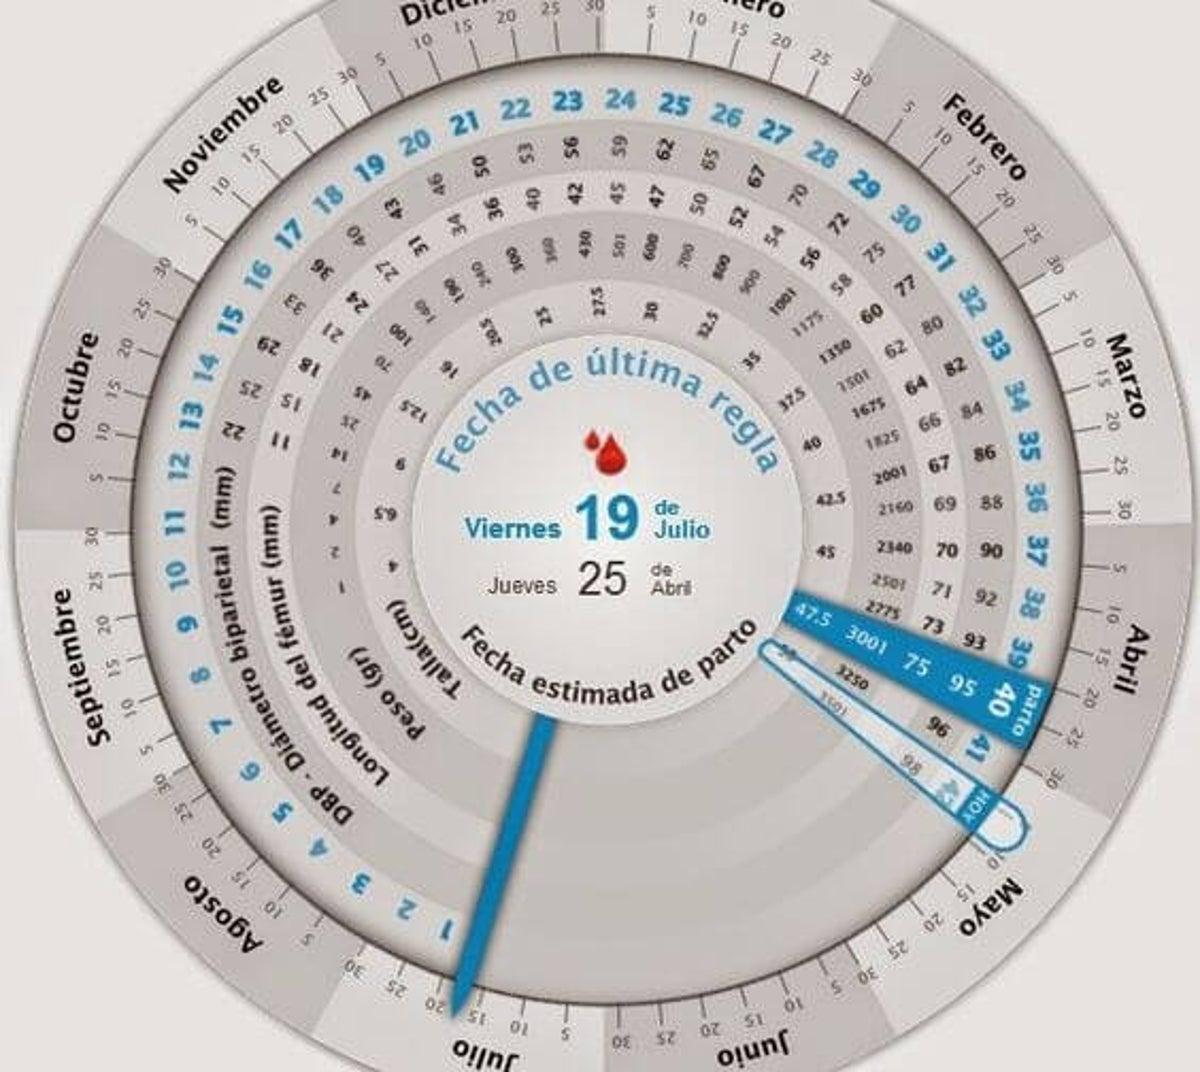 calculadora de época likely de concepcion